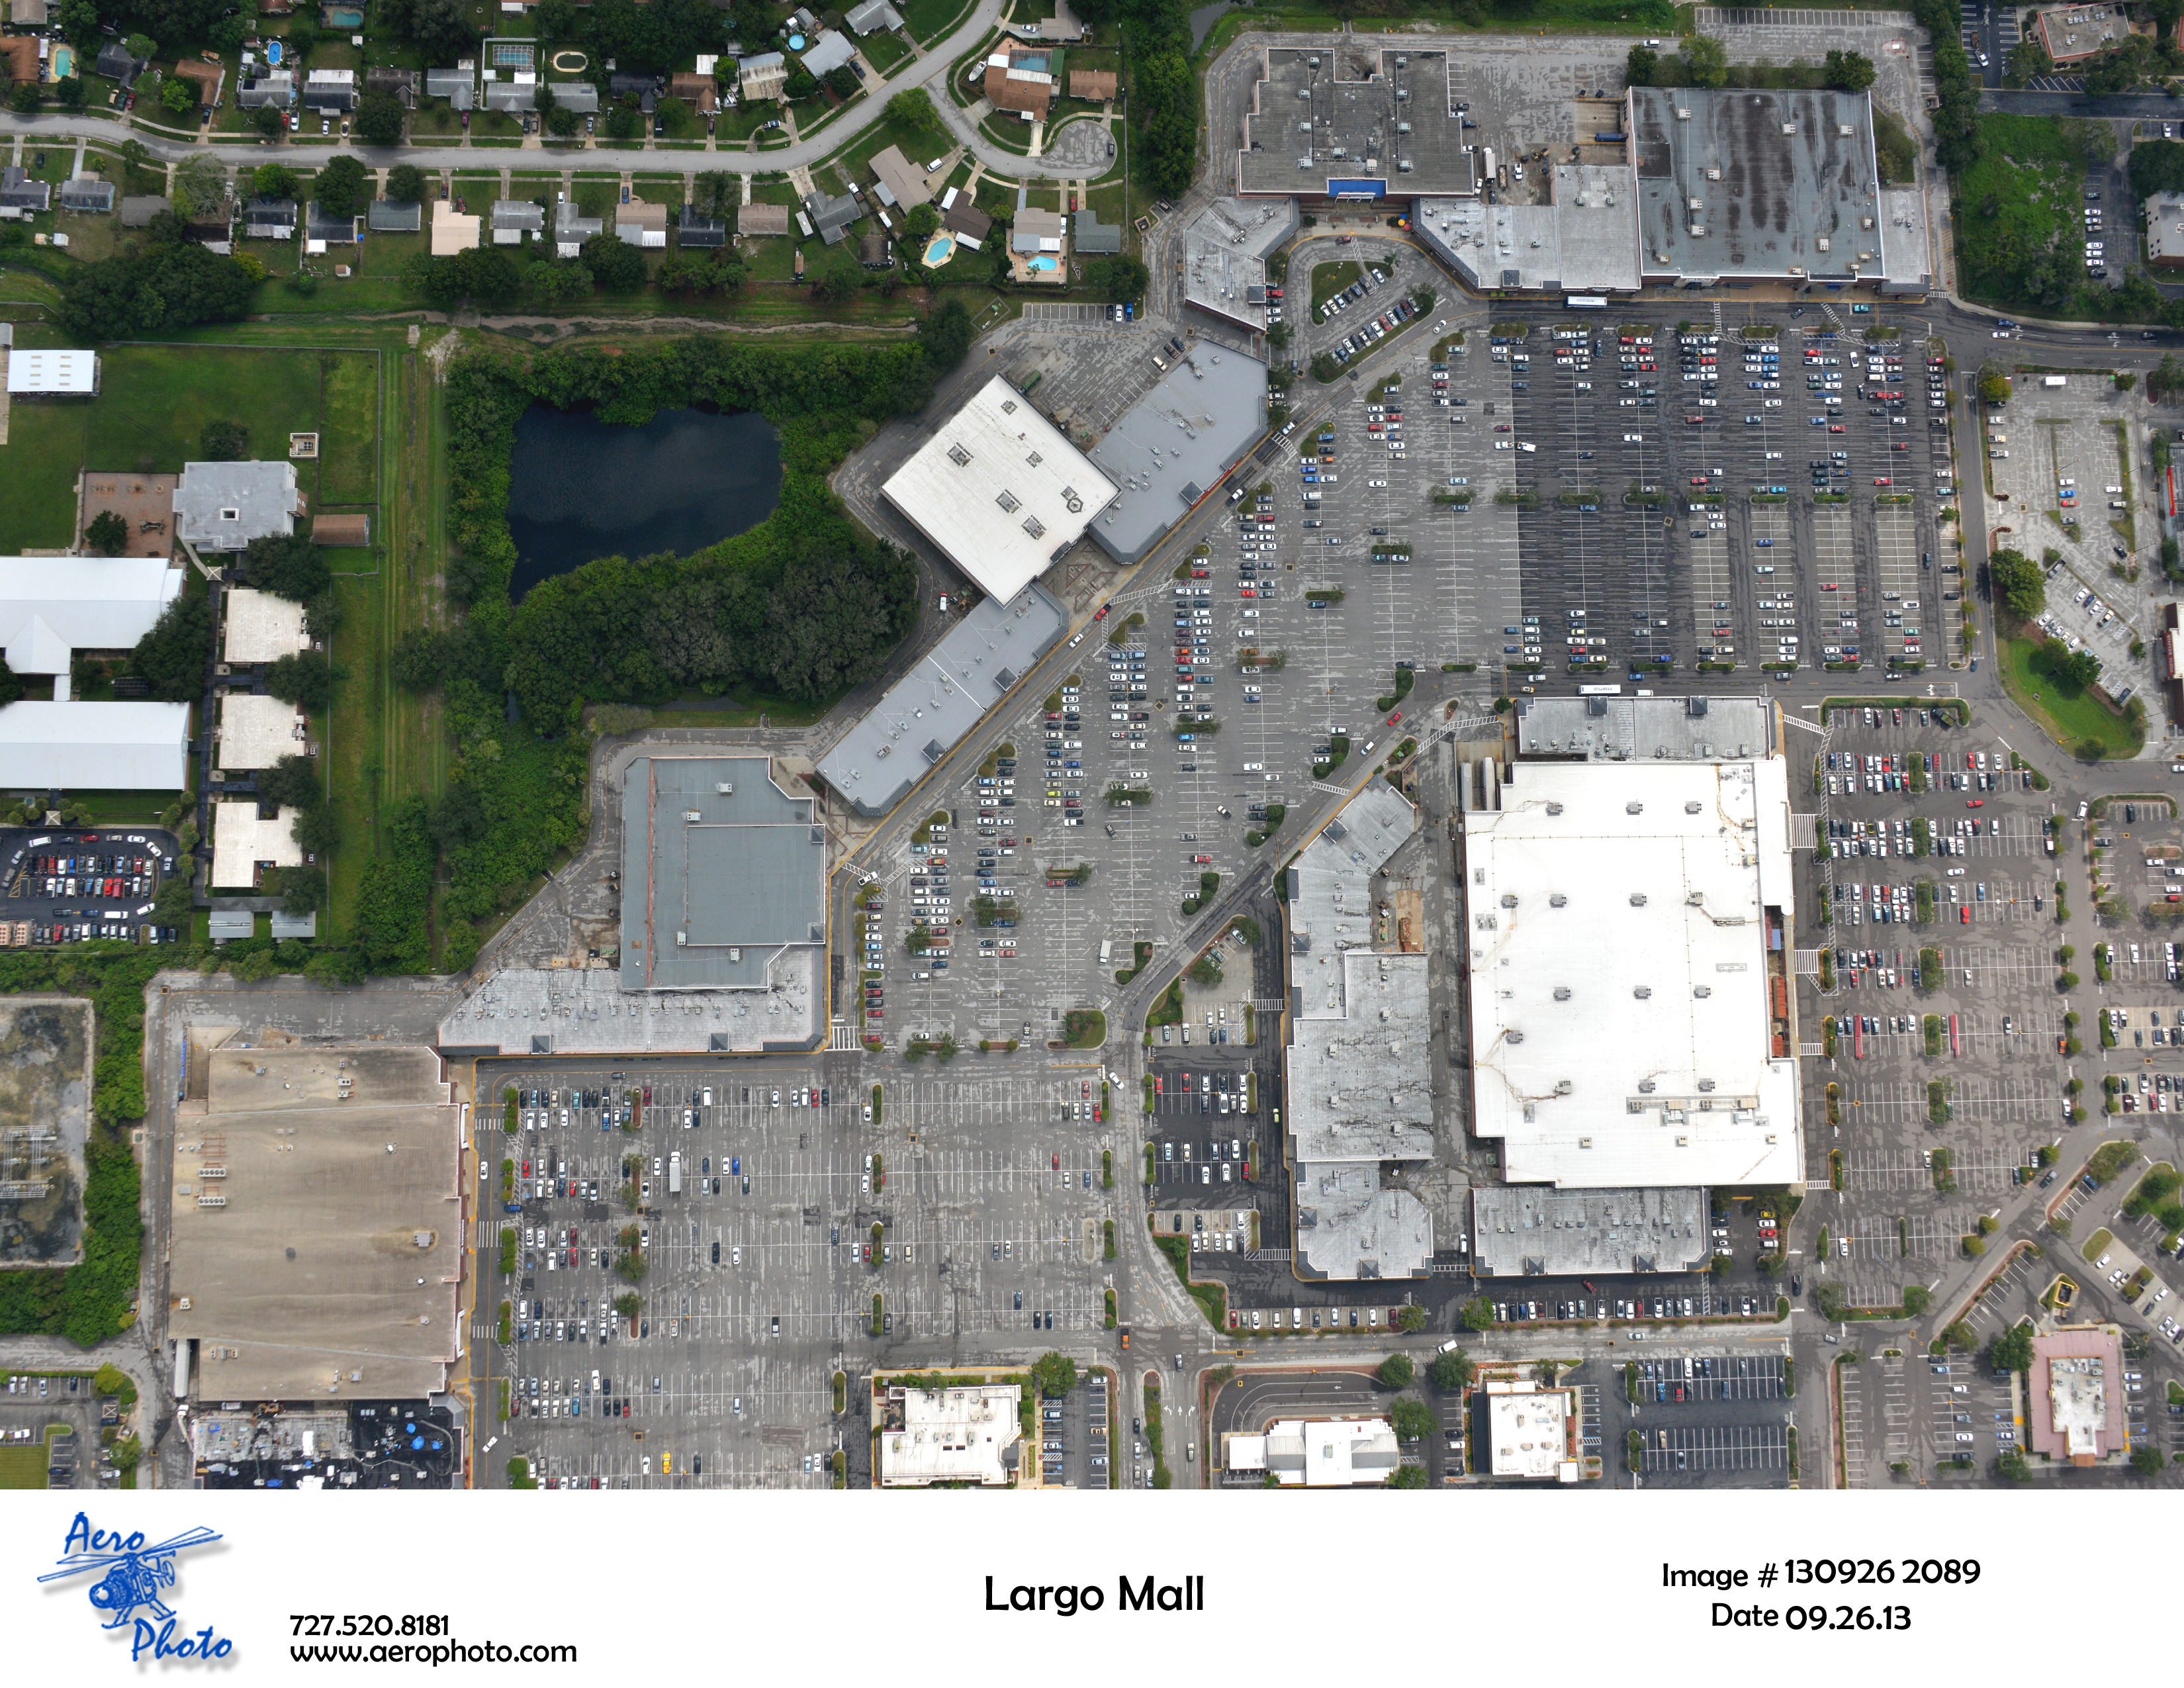 Largo Mall 1309262089